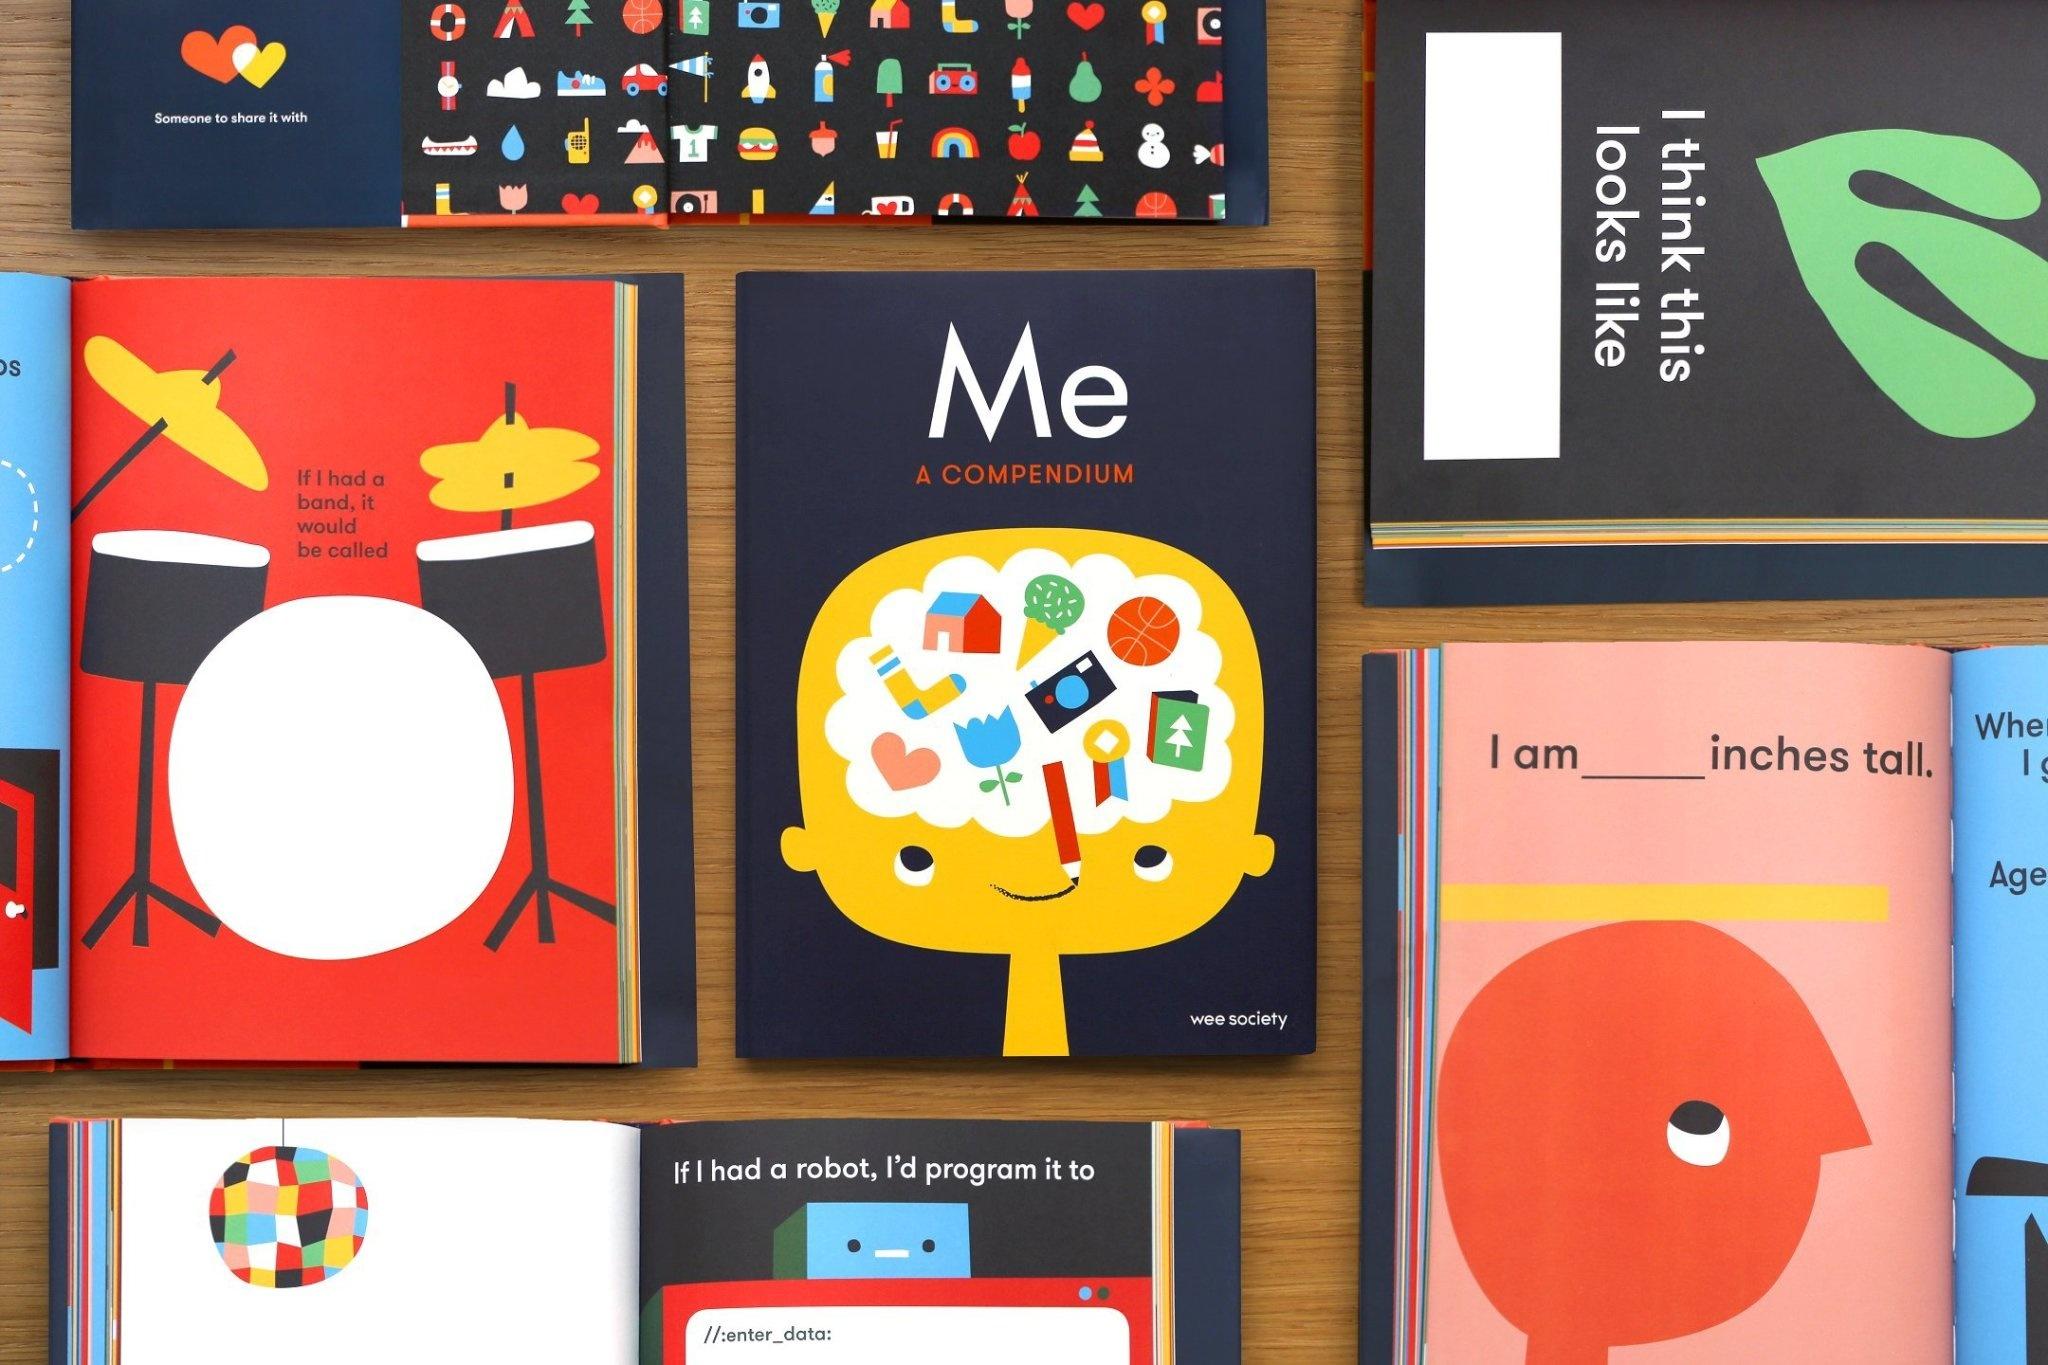 Me: A Compendium Book